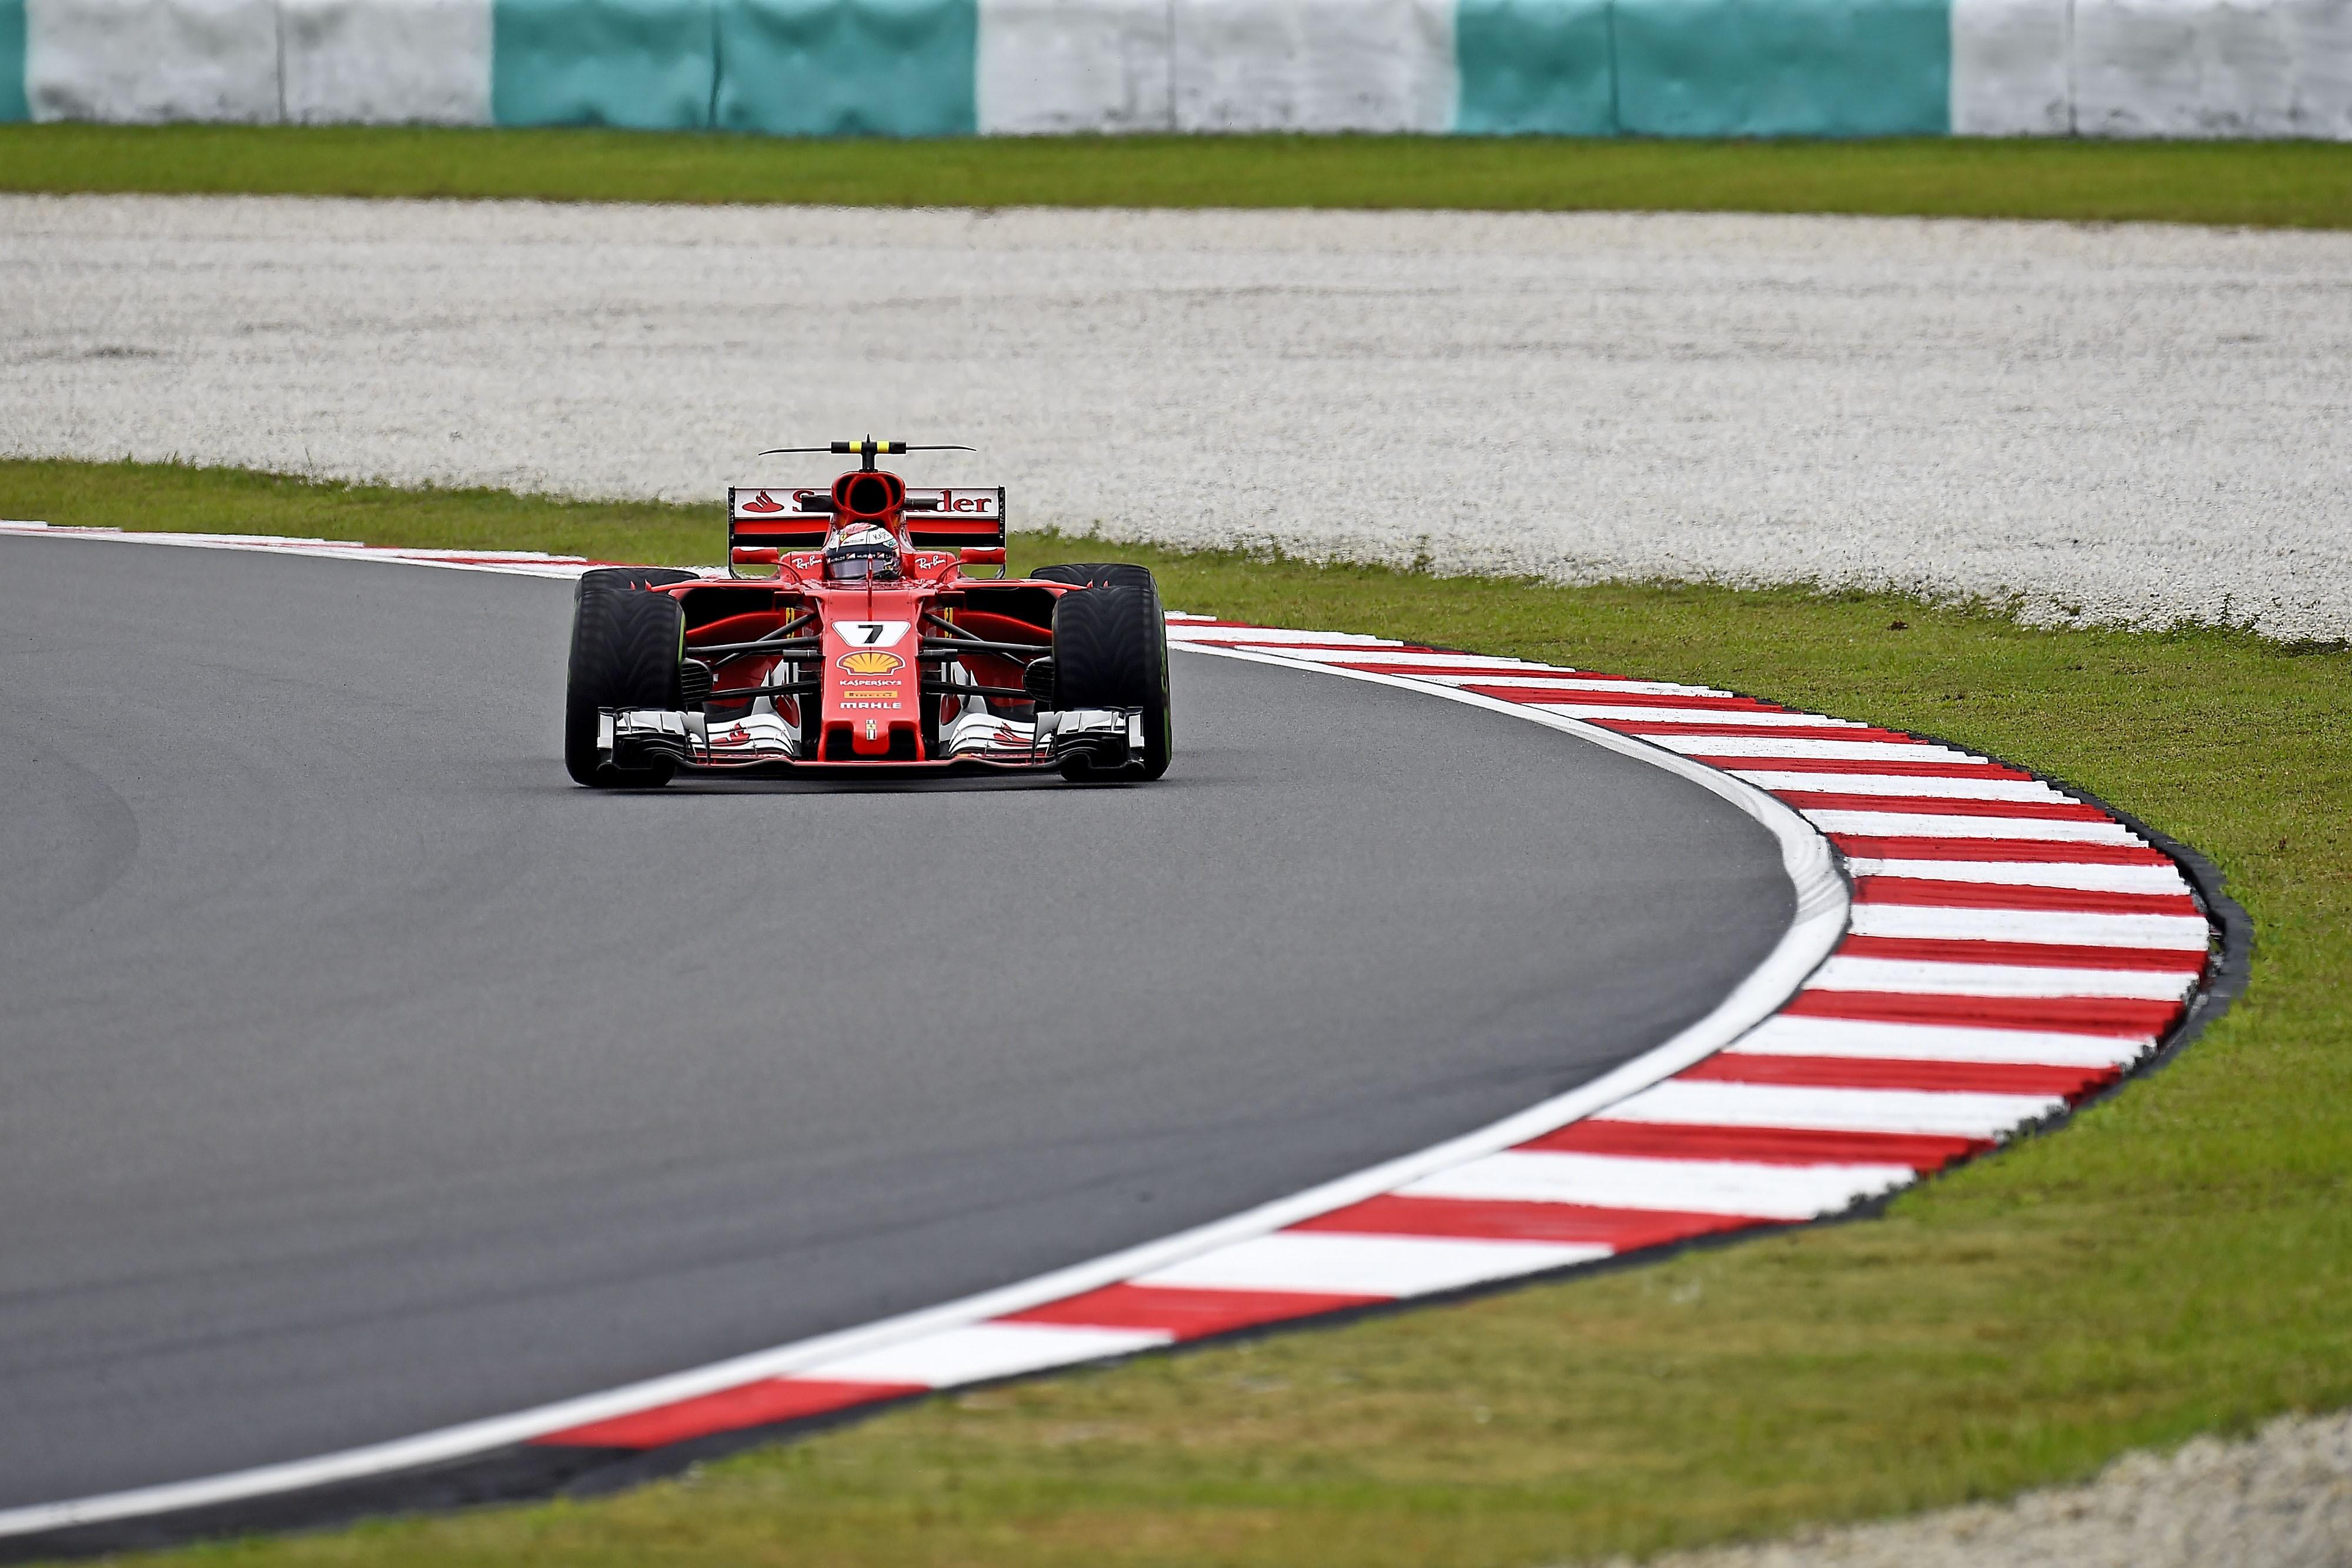 Kimi Räikkönen (Ferrari) au Grand Prix de Malaisie 2017